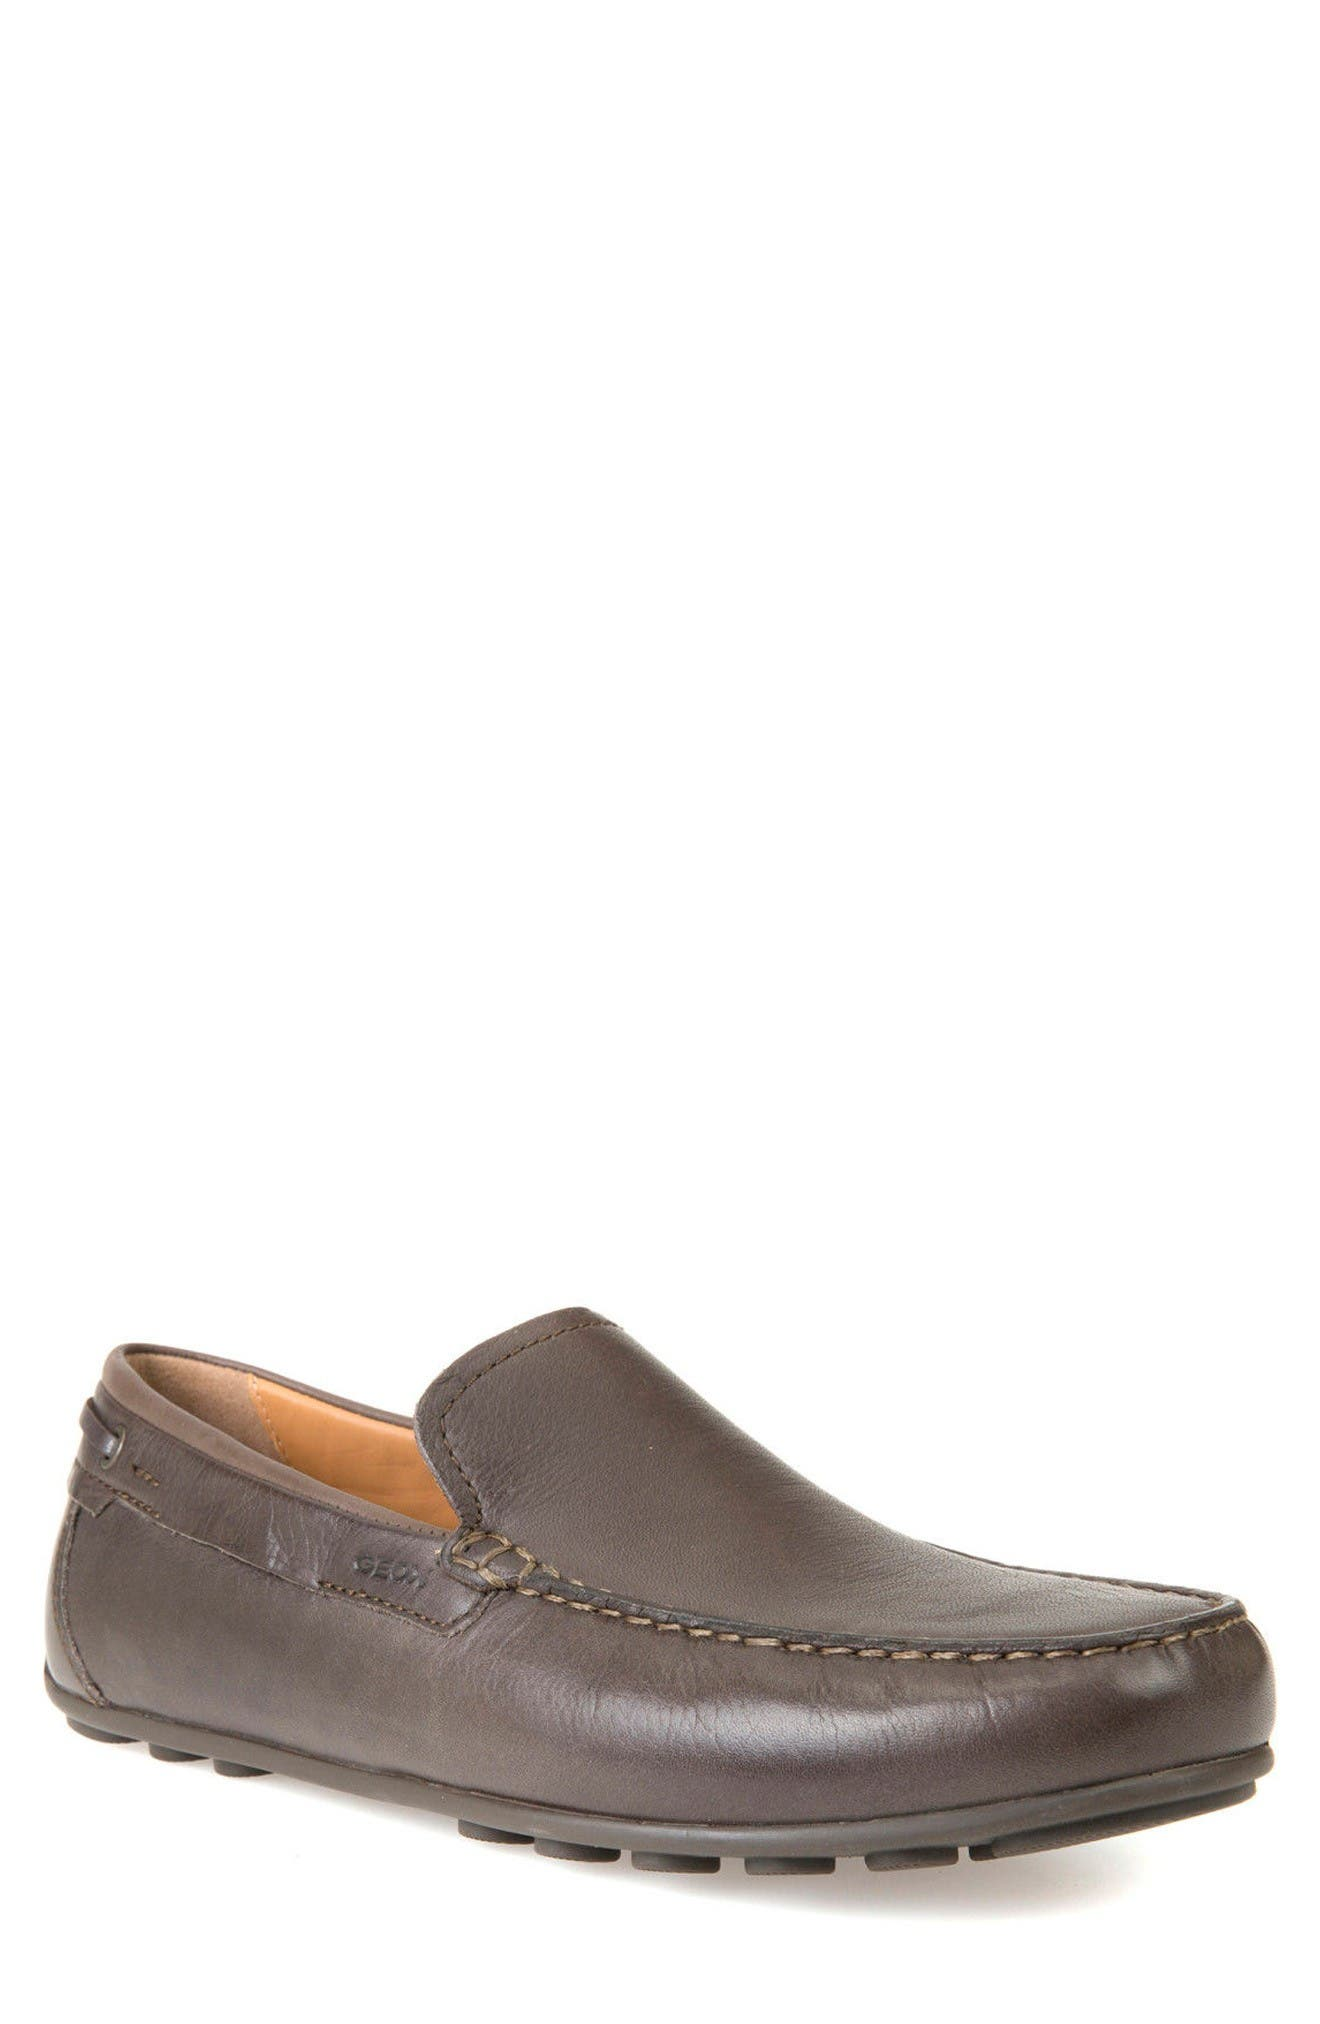 Geox Giona 8 Driving Shoe (Men)